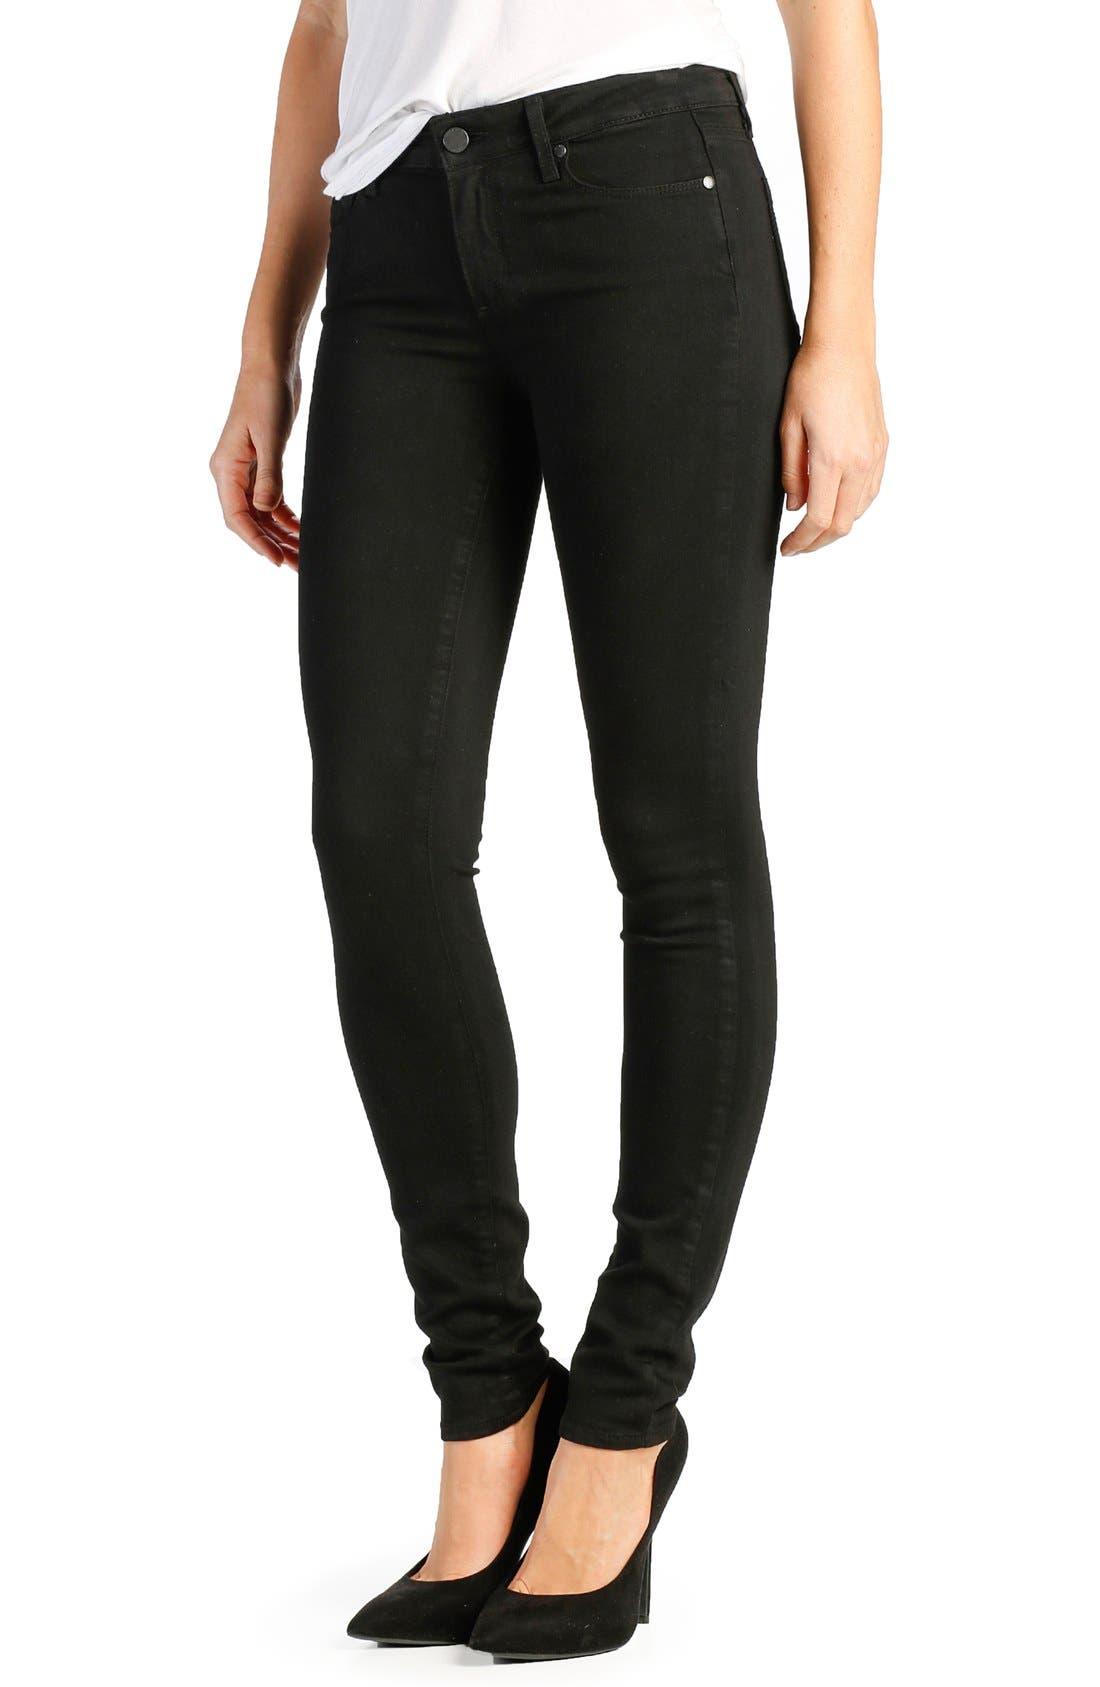 PAIGE Transcend -Leggy Ultra Skinny Jeans (Black Shadow) (Long)